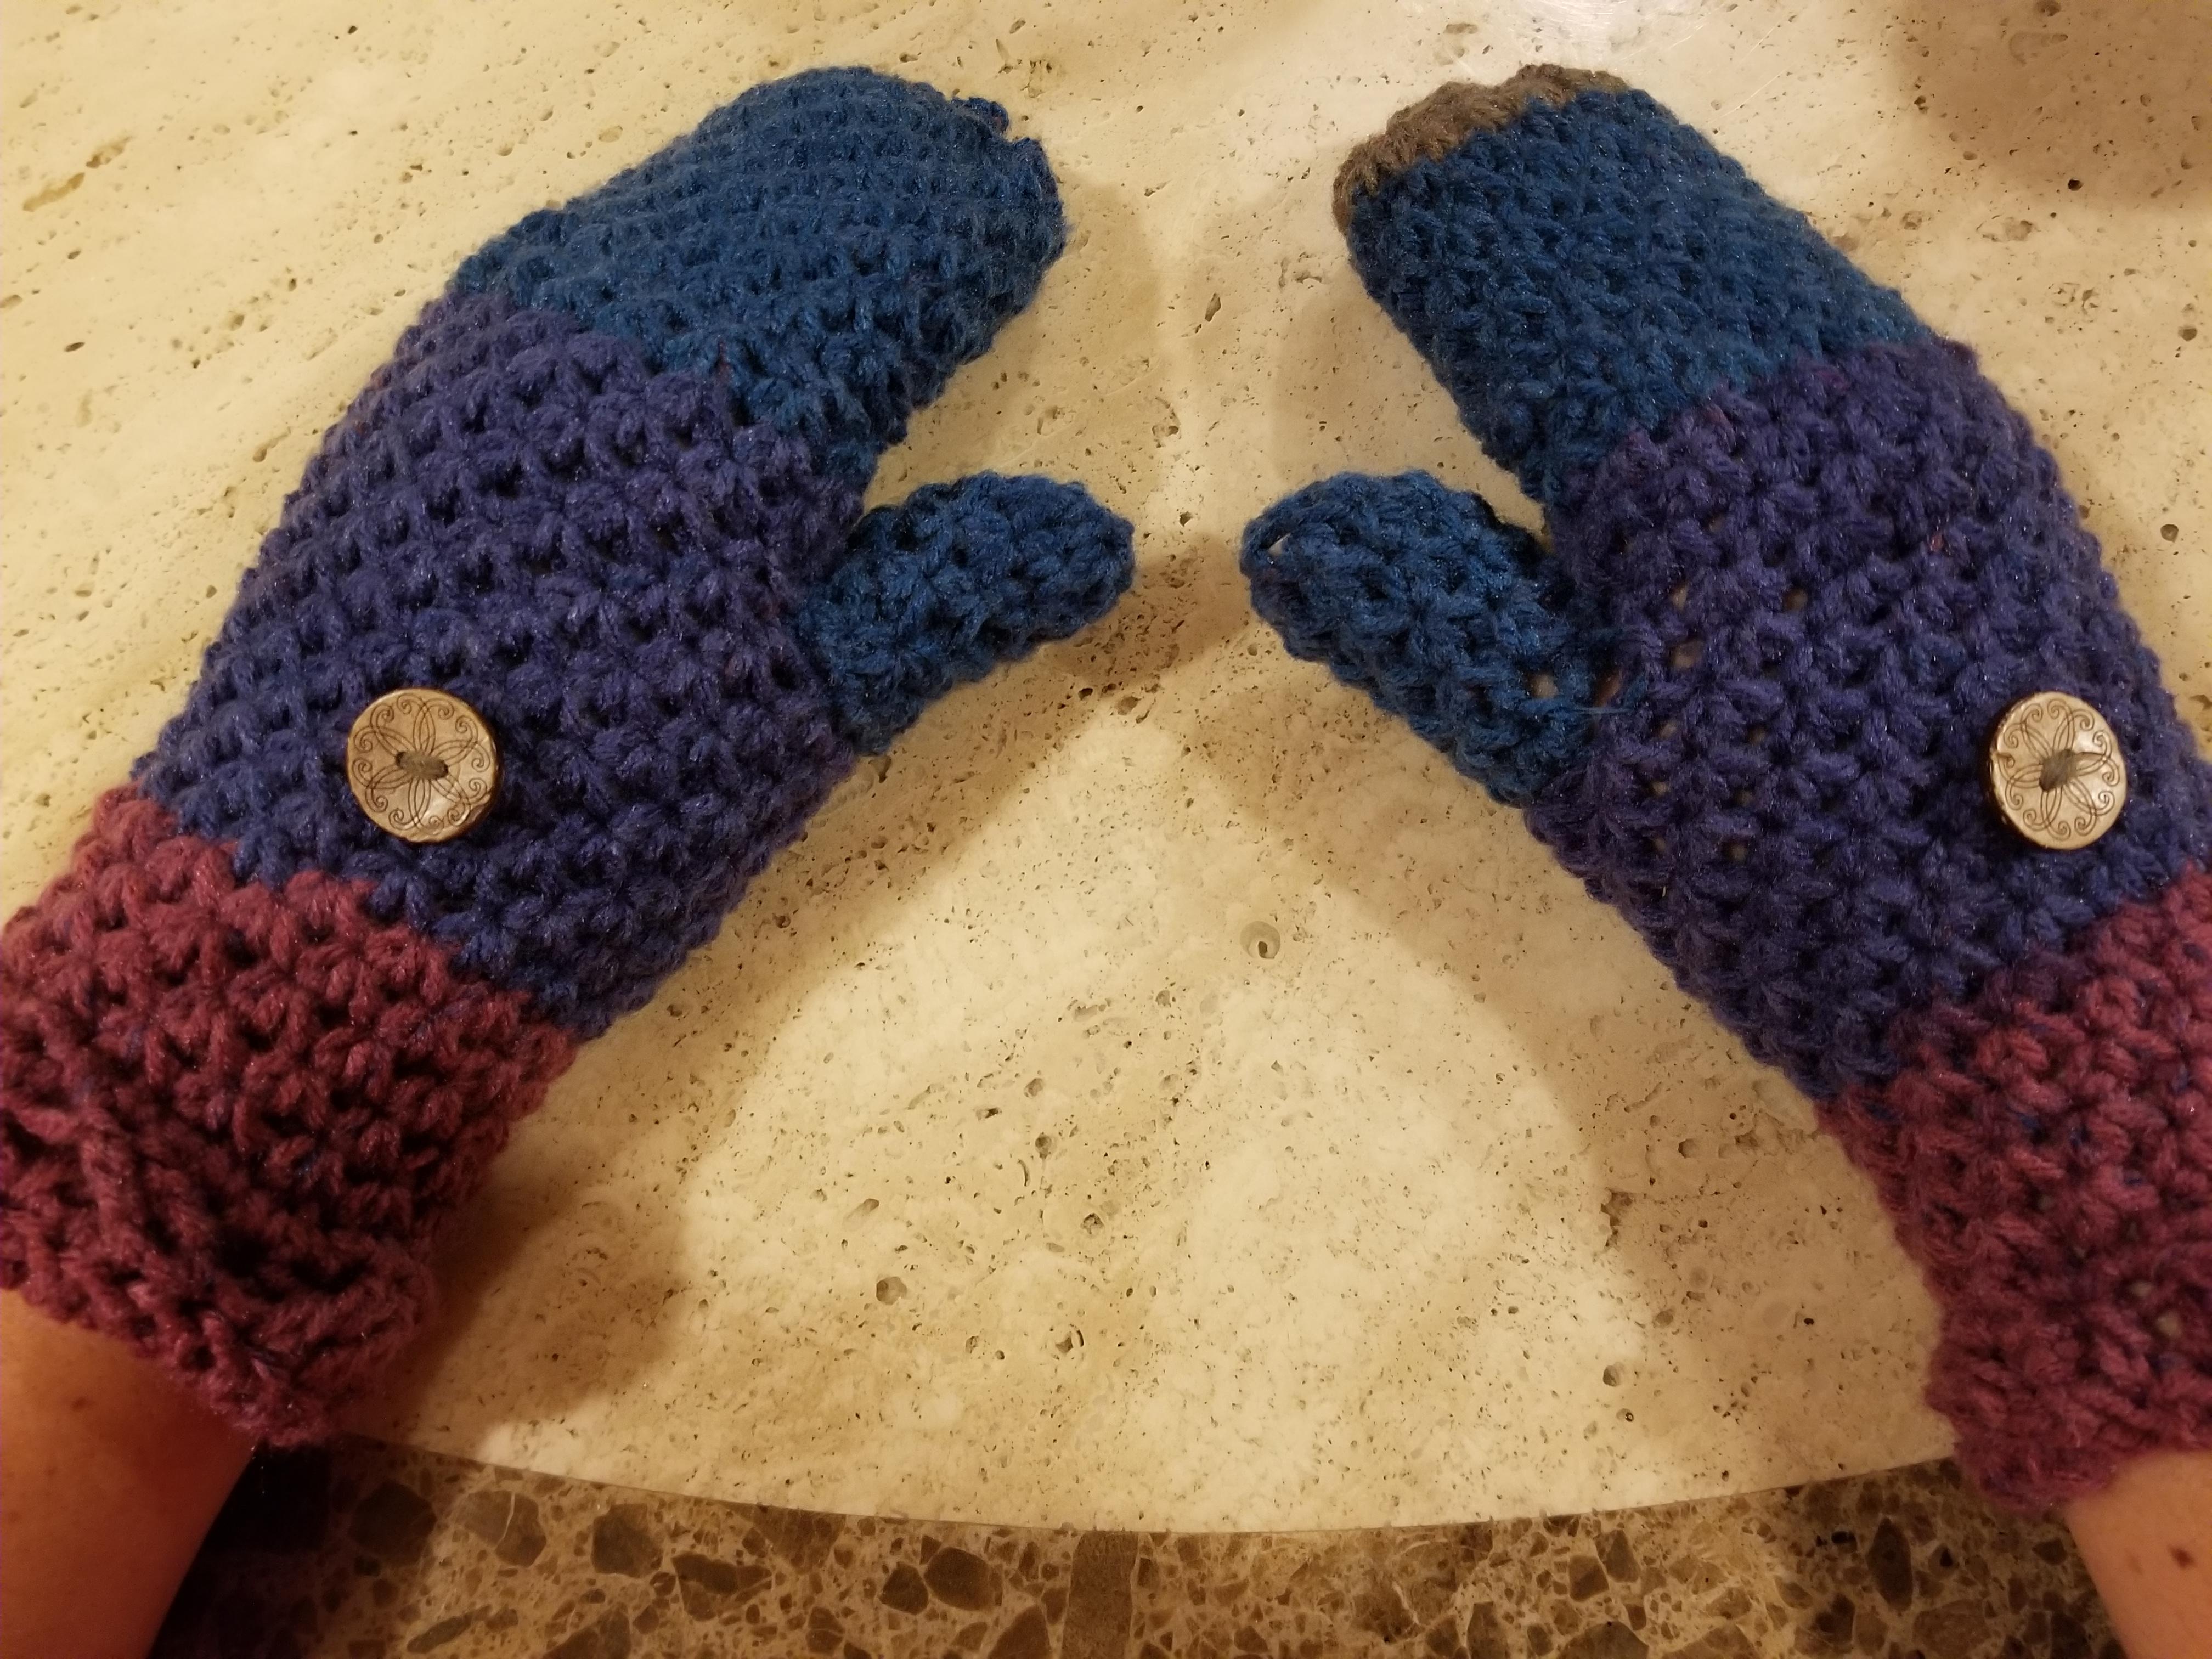 Crochet Heavenly Blessing Matching Set Scarf Fingerless